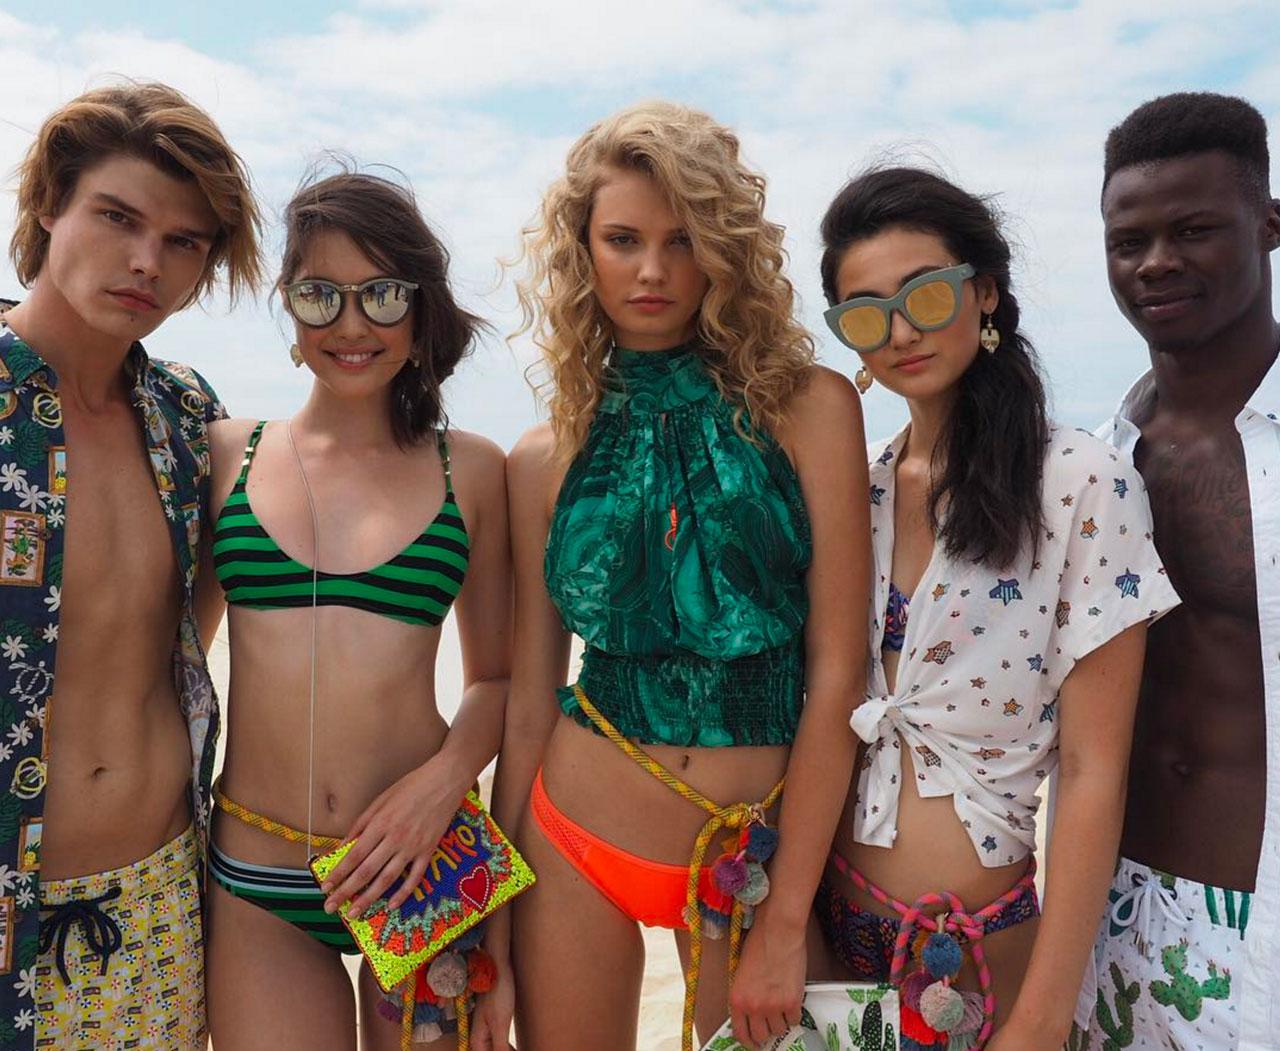 These 4 swimwear trends will dominate summer 2017